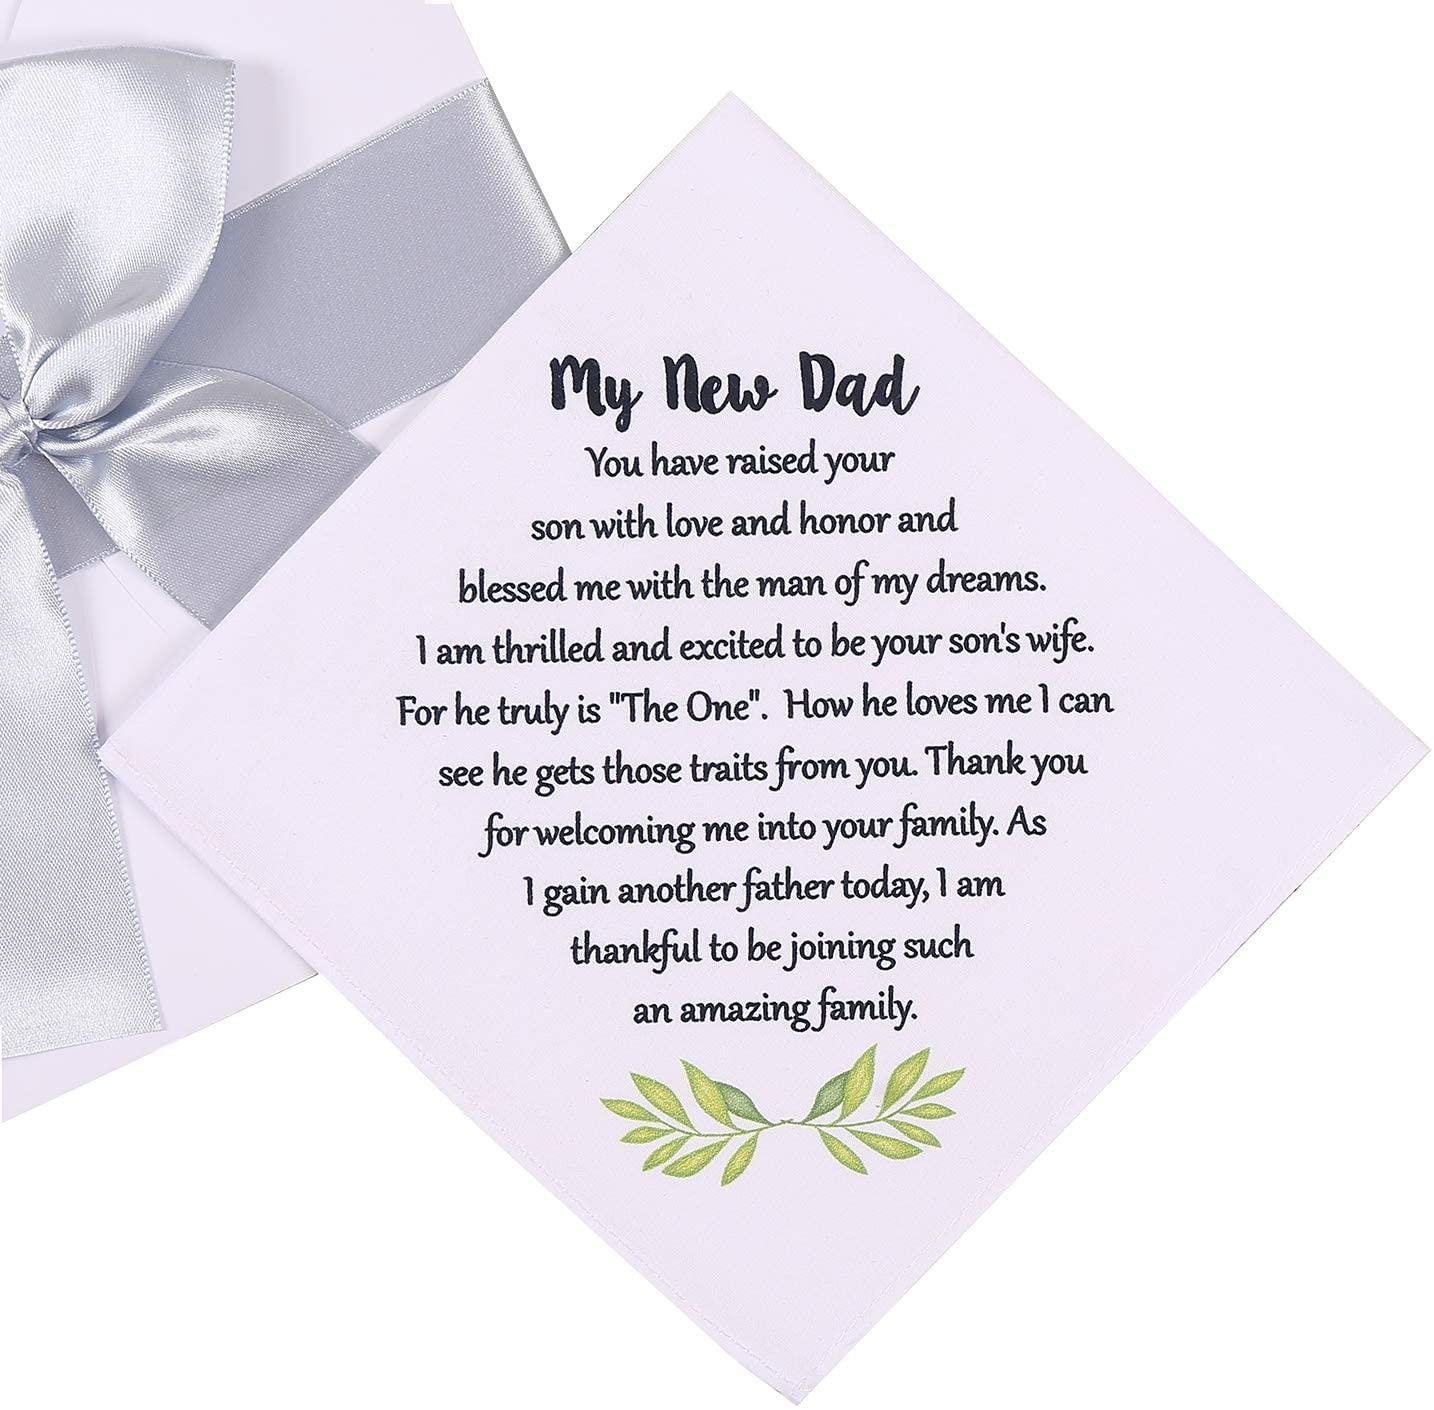 Wedding Handkerchief for New Dad, Wedding Gift for Grooms Father, New Dad Hankie from Bride Wedding Keepsake (New Dad)